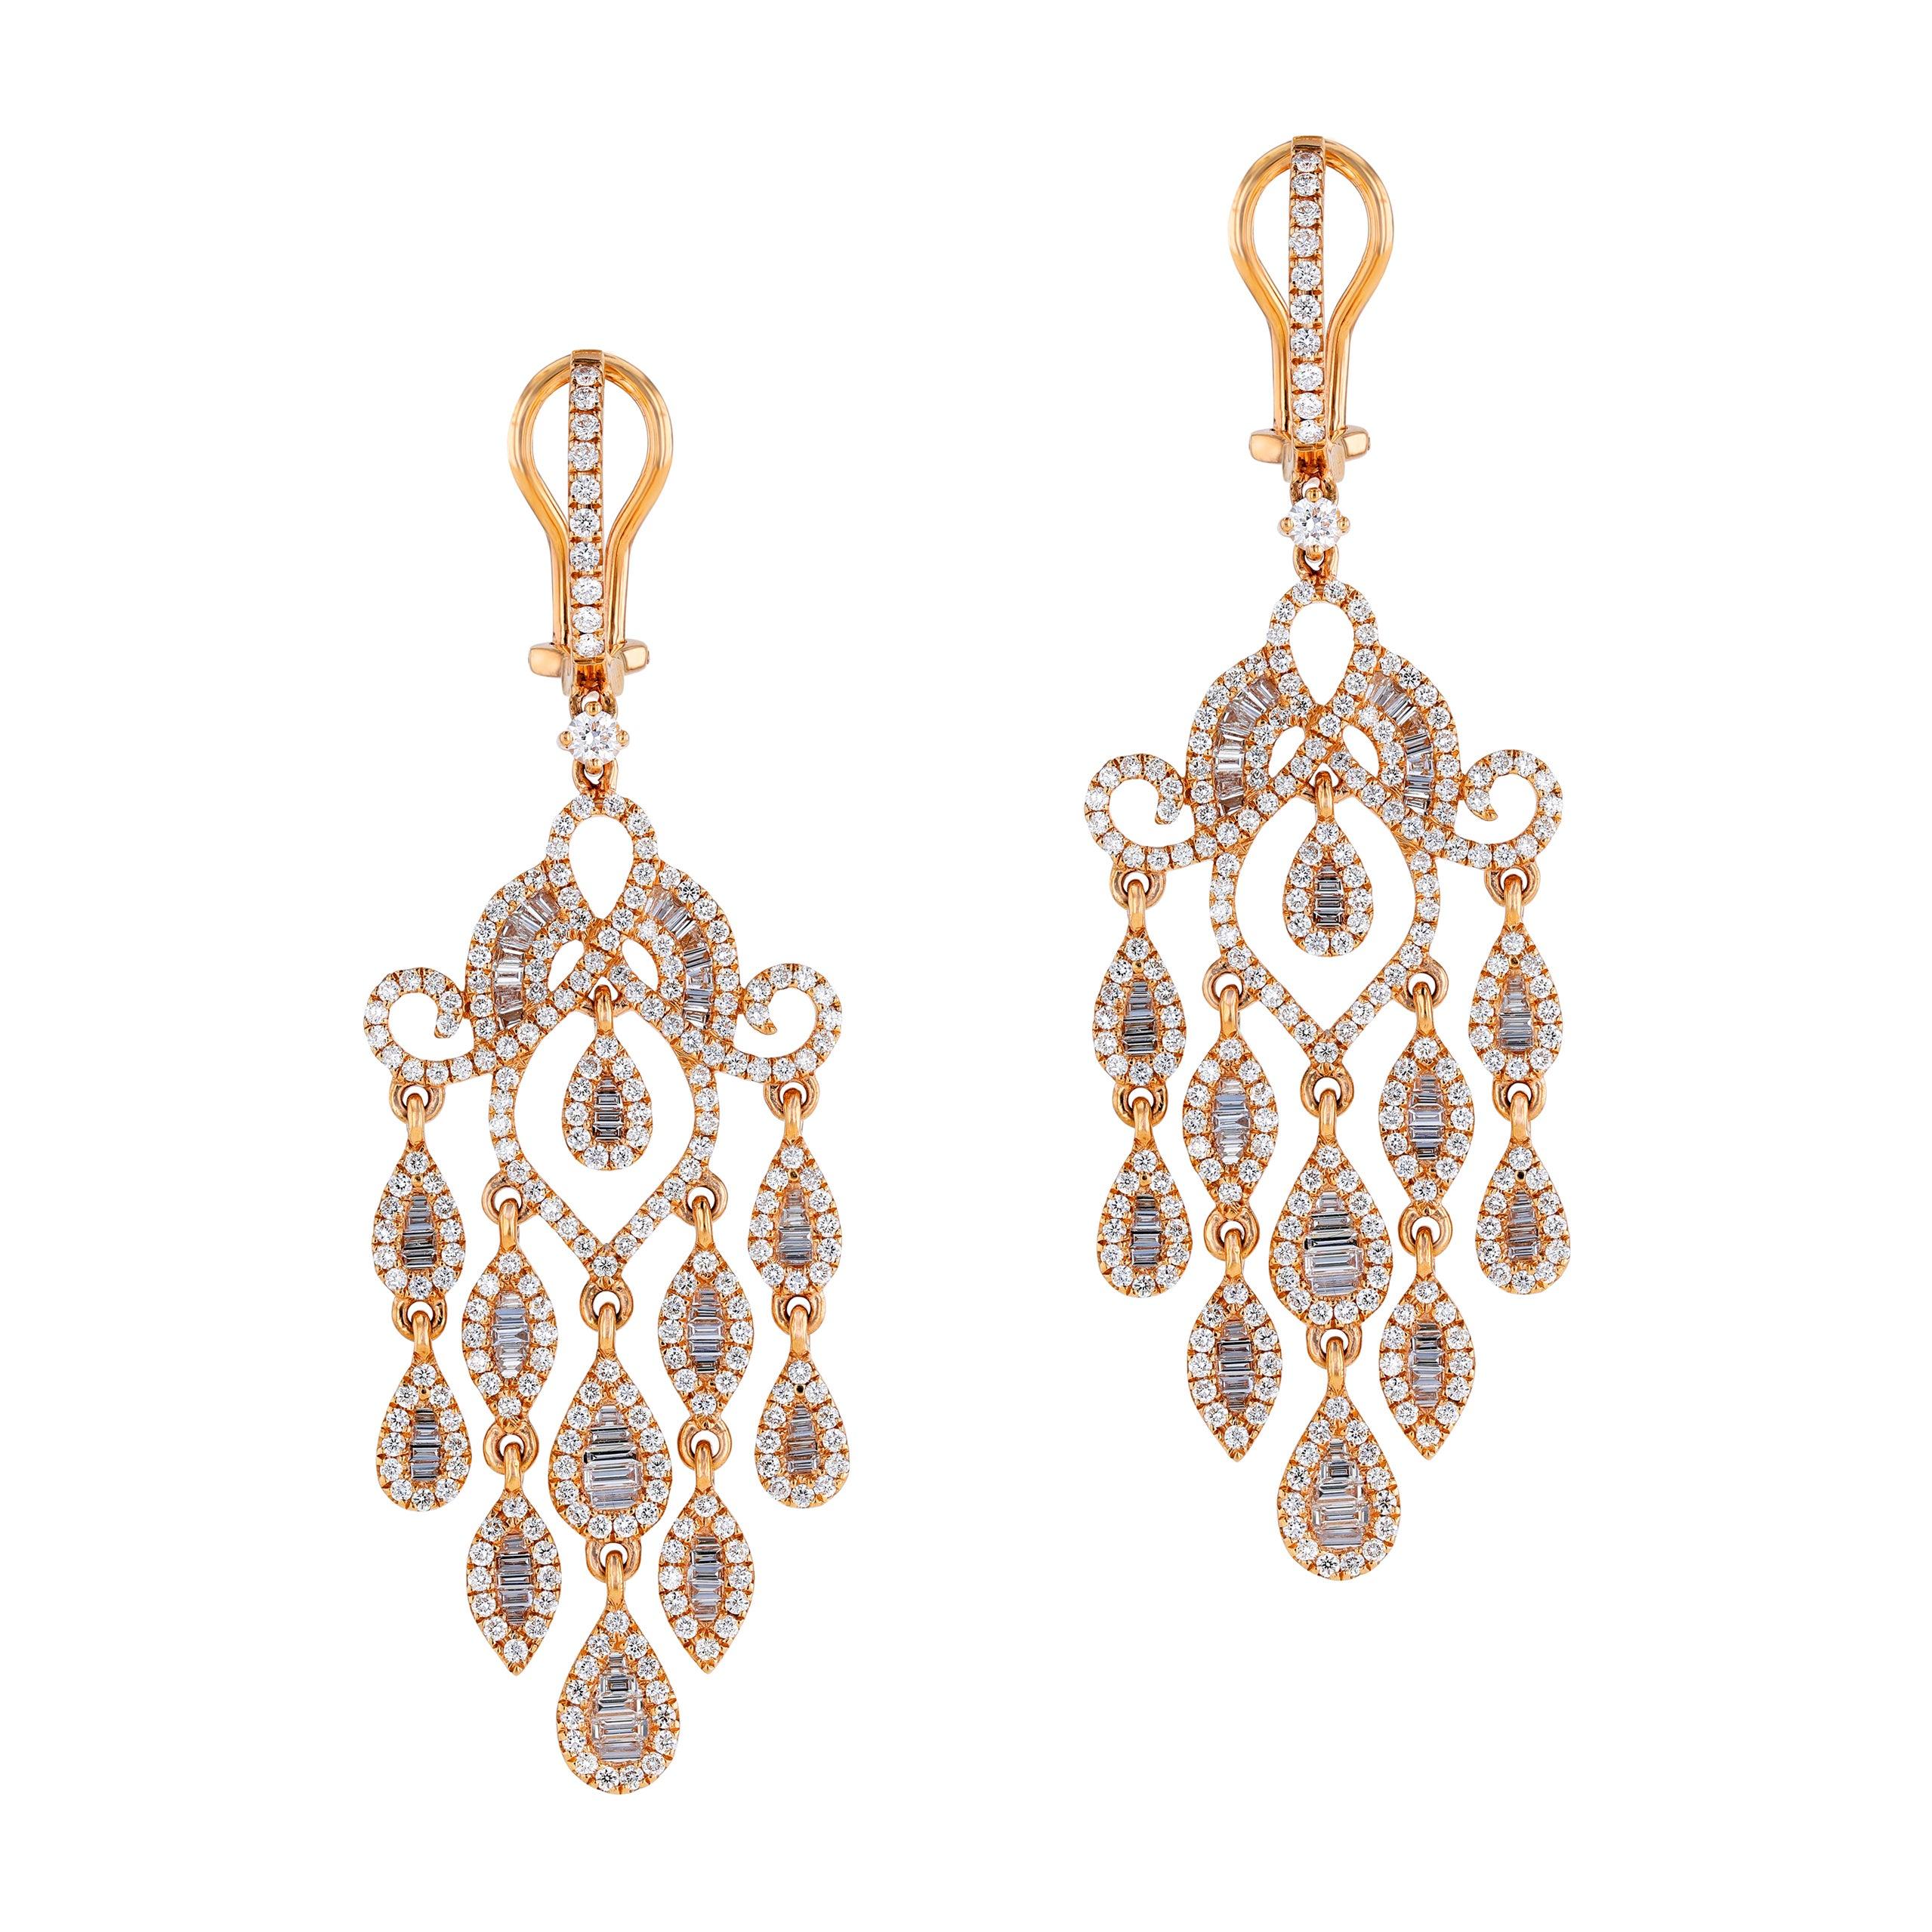 Amwaj Jewelry Rose Gold with White Diamonds Earrings